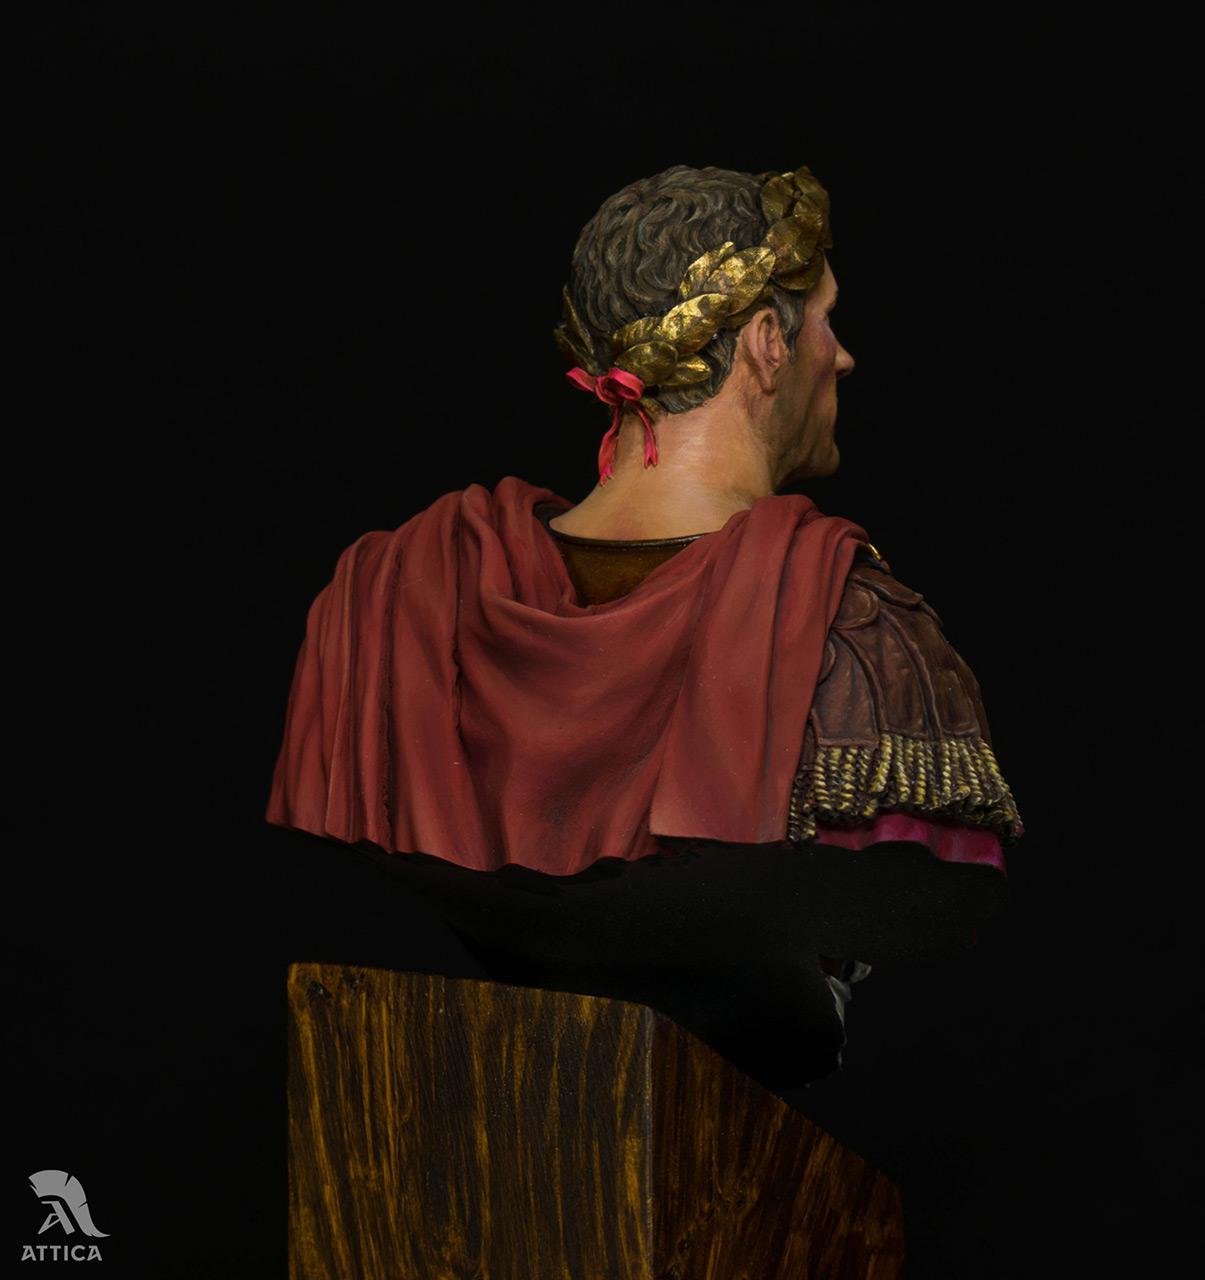 Figures: The Triumpher, photo #5